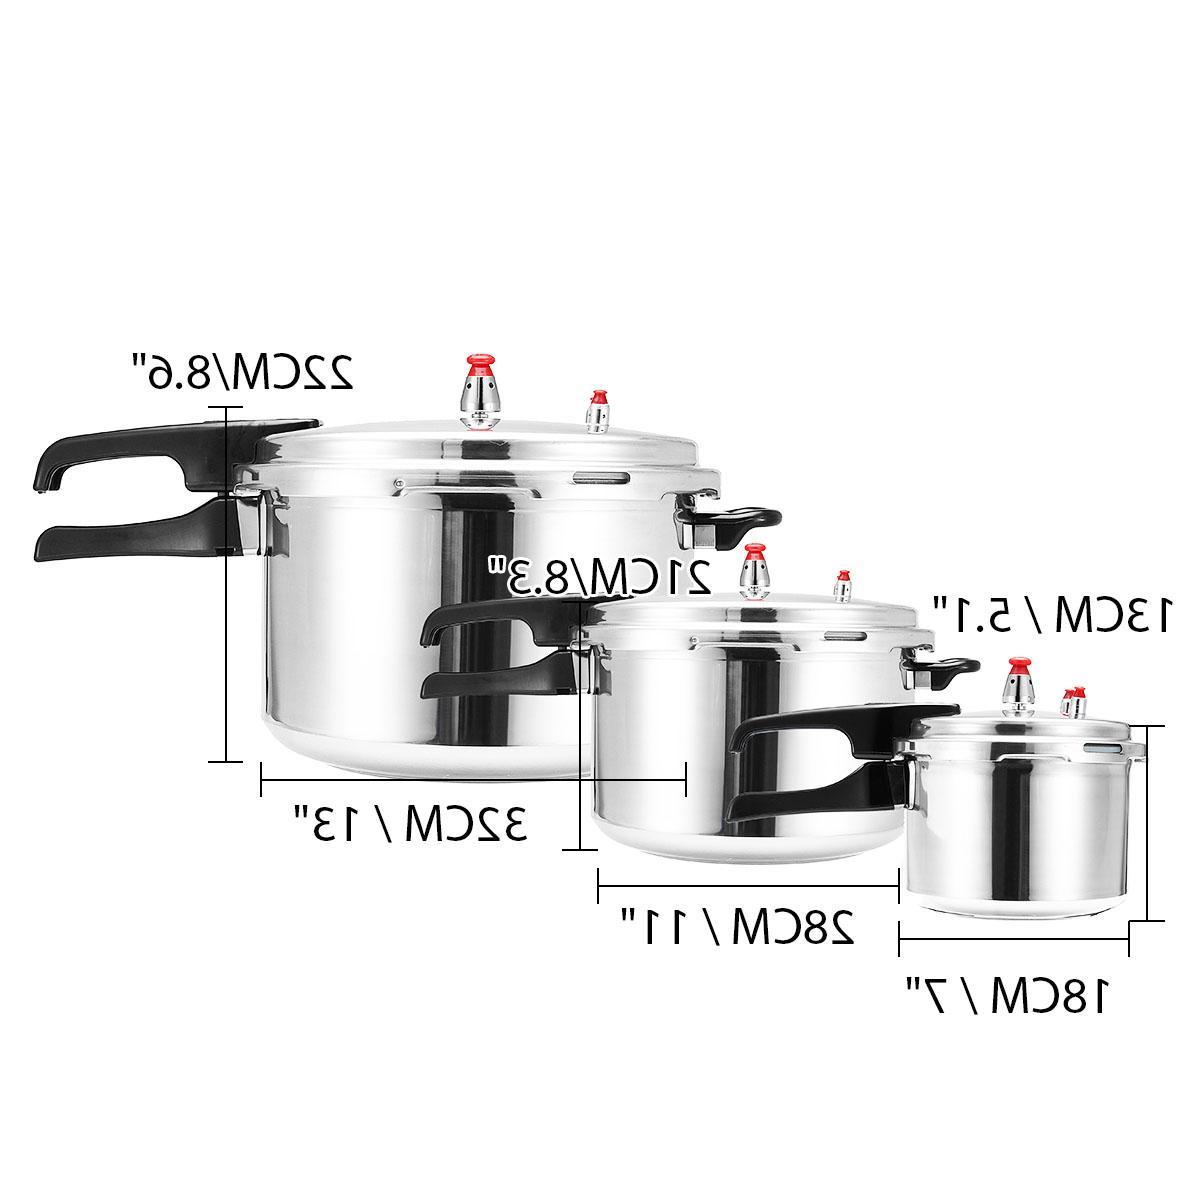 3L/11L/17L Aluminium Alloy <font><b>Pressure</b></font> <font><b>Cooker</b></font> Gas Cooking Energy-saving Light-<font><b>weight</b></font>